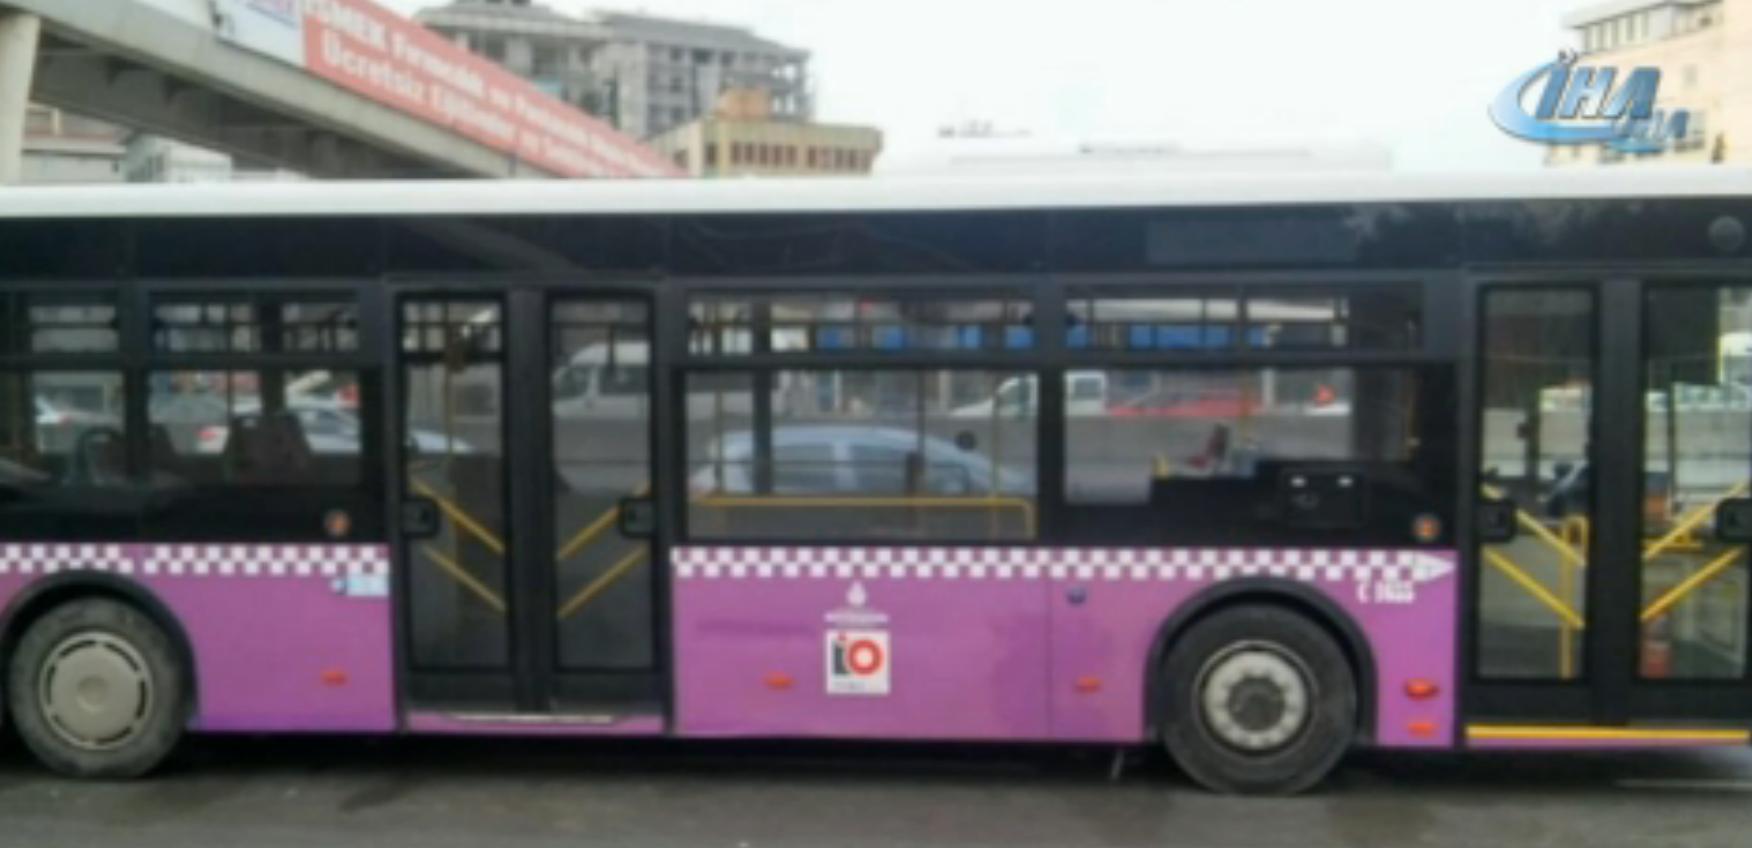 Minibüs şöförü yolcuların gözü önünde kurşun yağdırdı